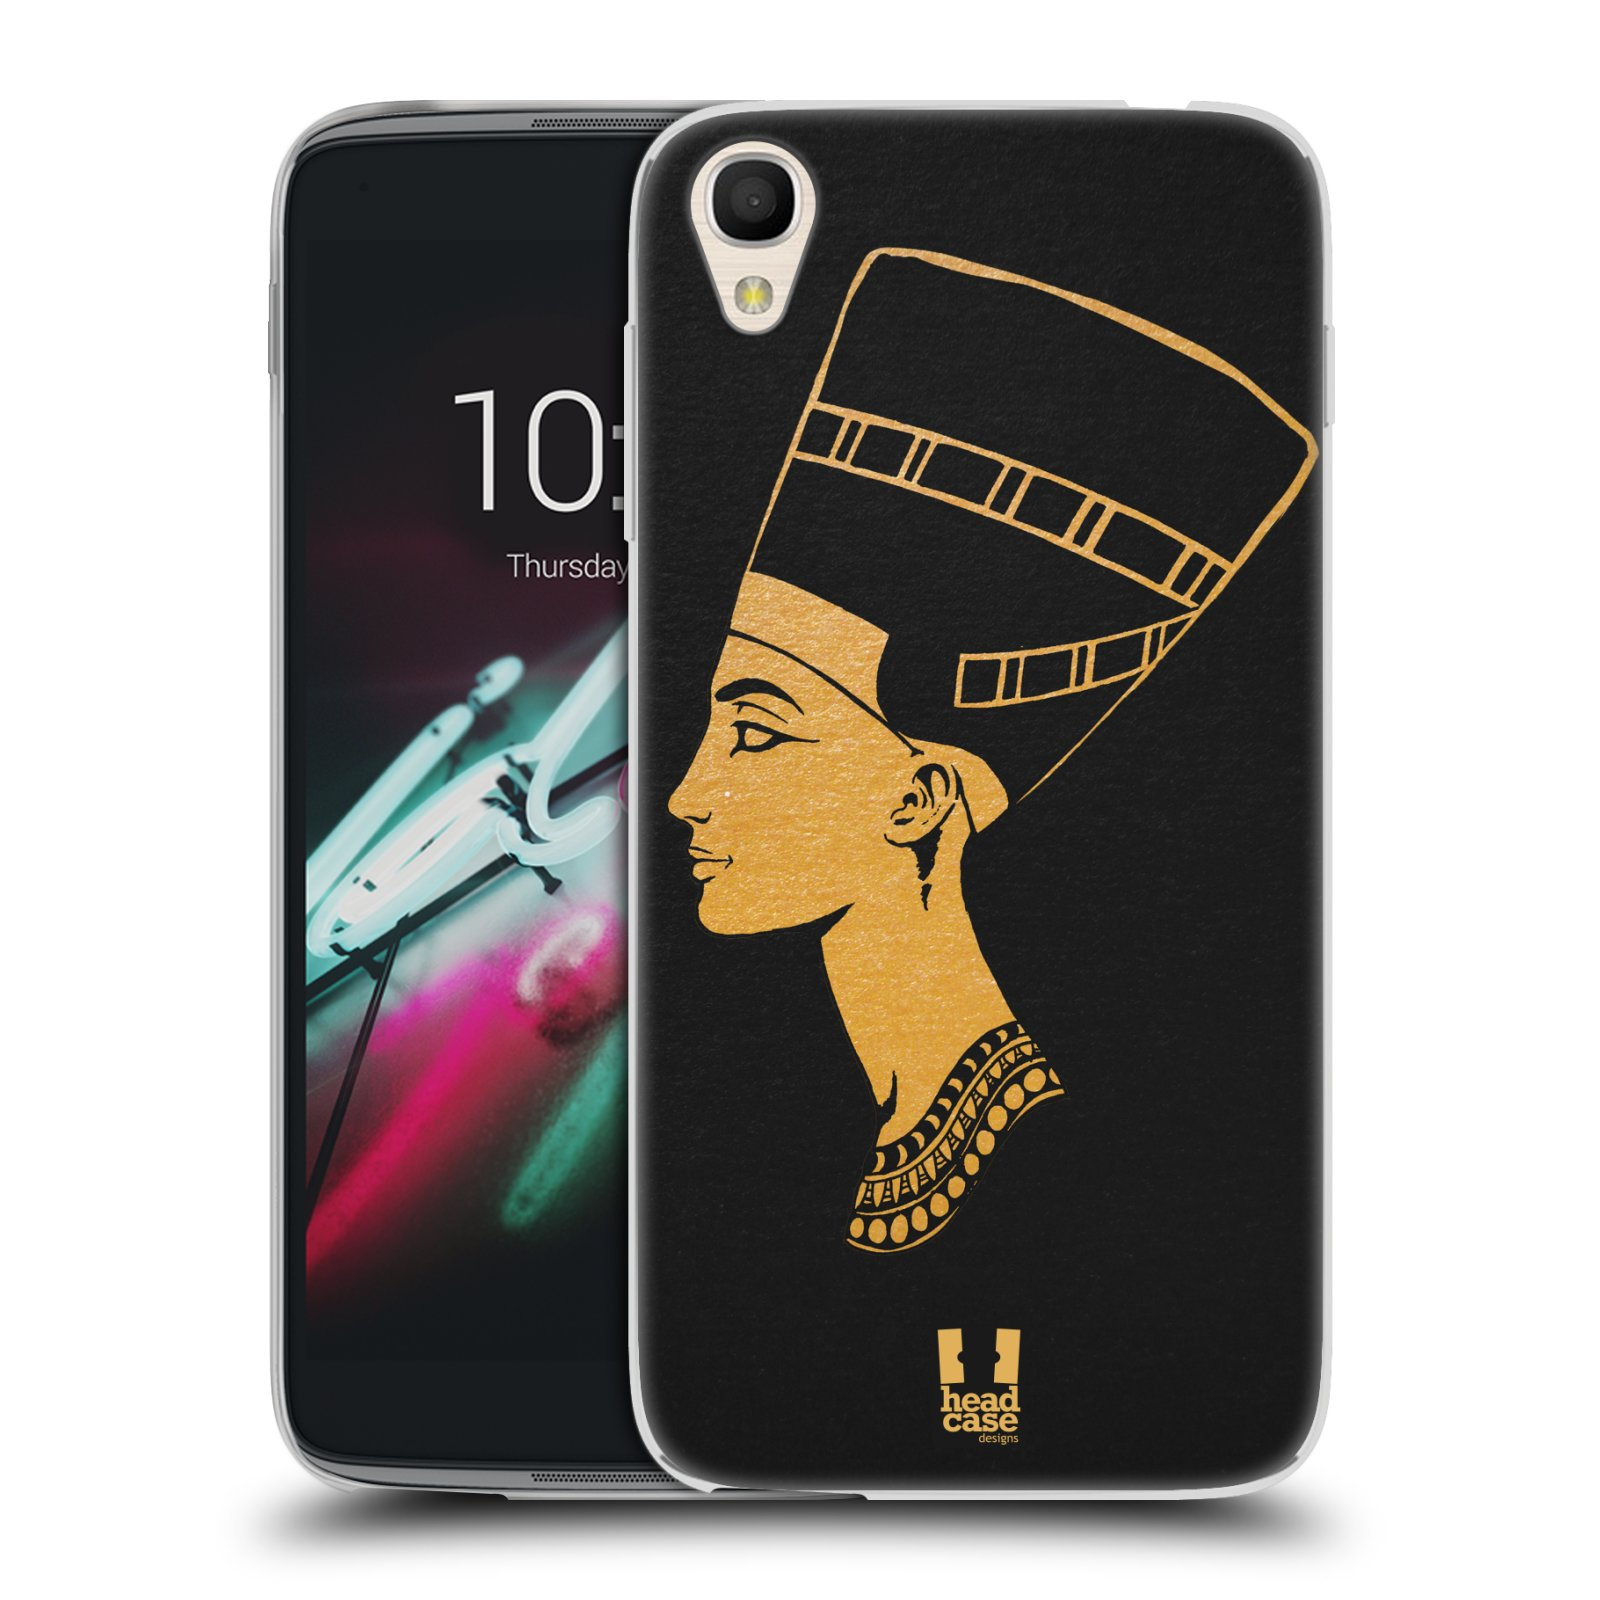 "Silikonové pouzdro na mobil Alcatel One Touch 6039Y Idol 3 HEAD CASE EGYPT NEFERTITI (Silikonový kryt či obal na mobilní telefon Alcatel One Touch Idol 3 OT-6039Y s 4,7"" displejem)"